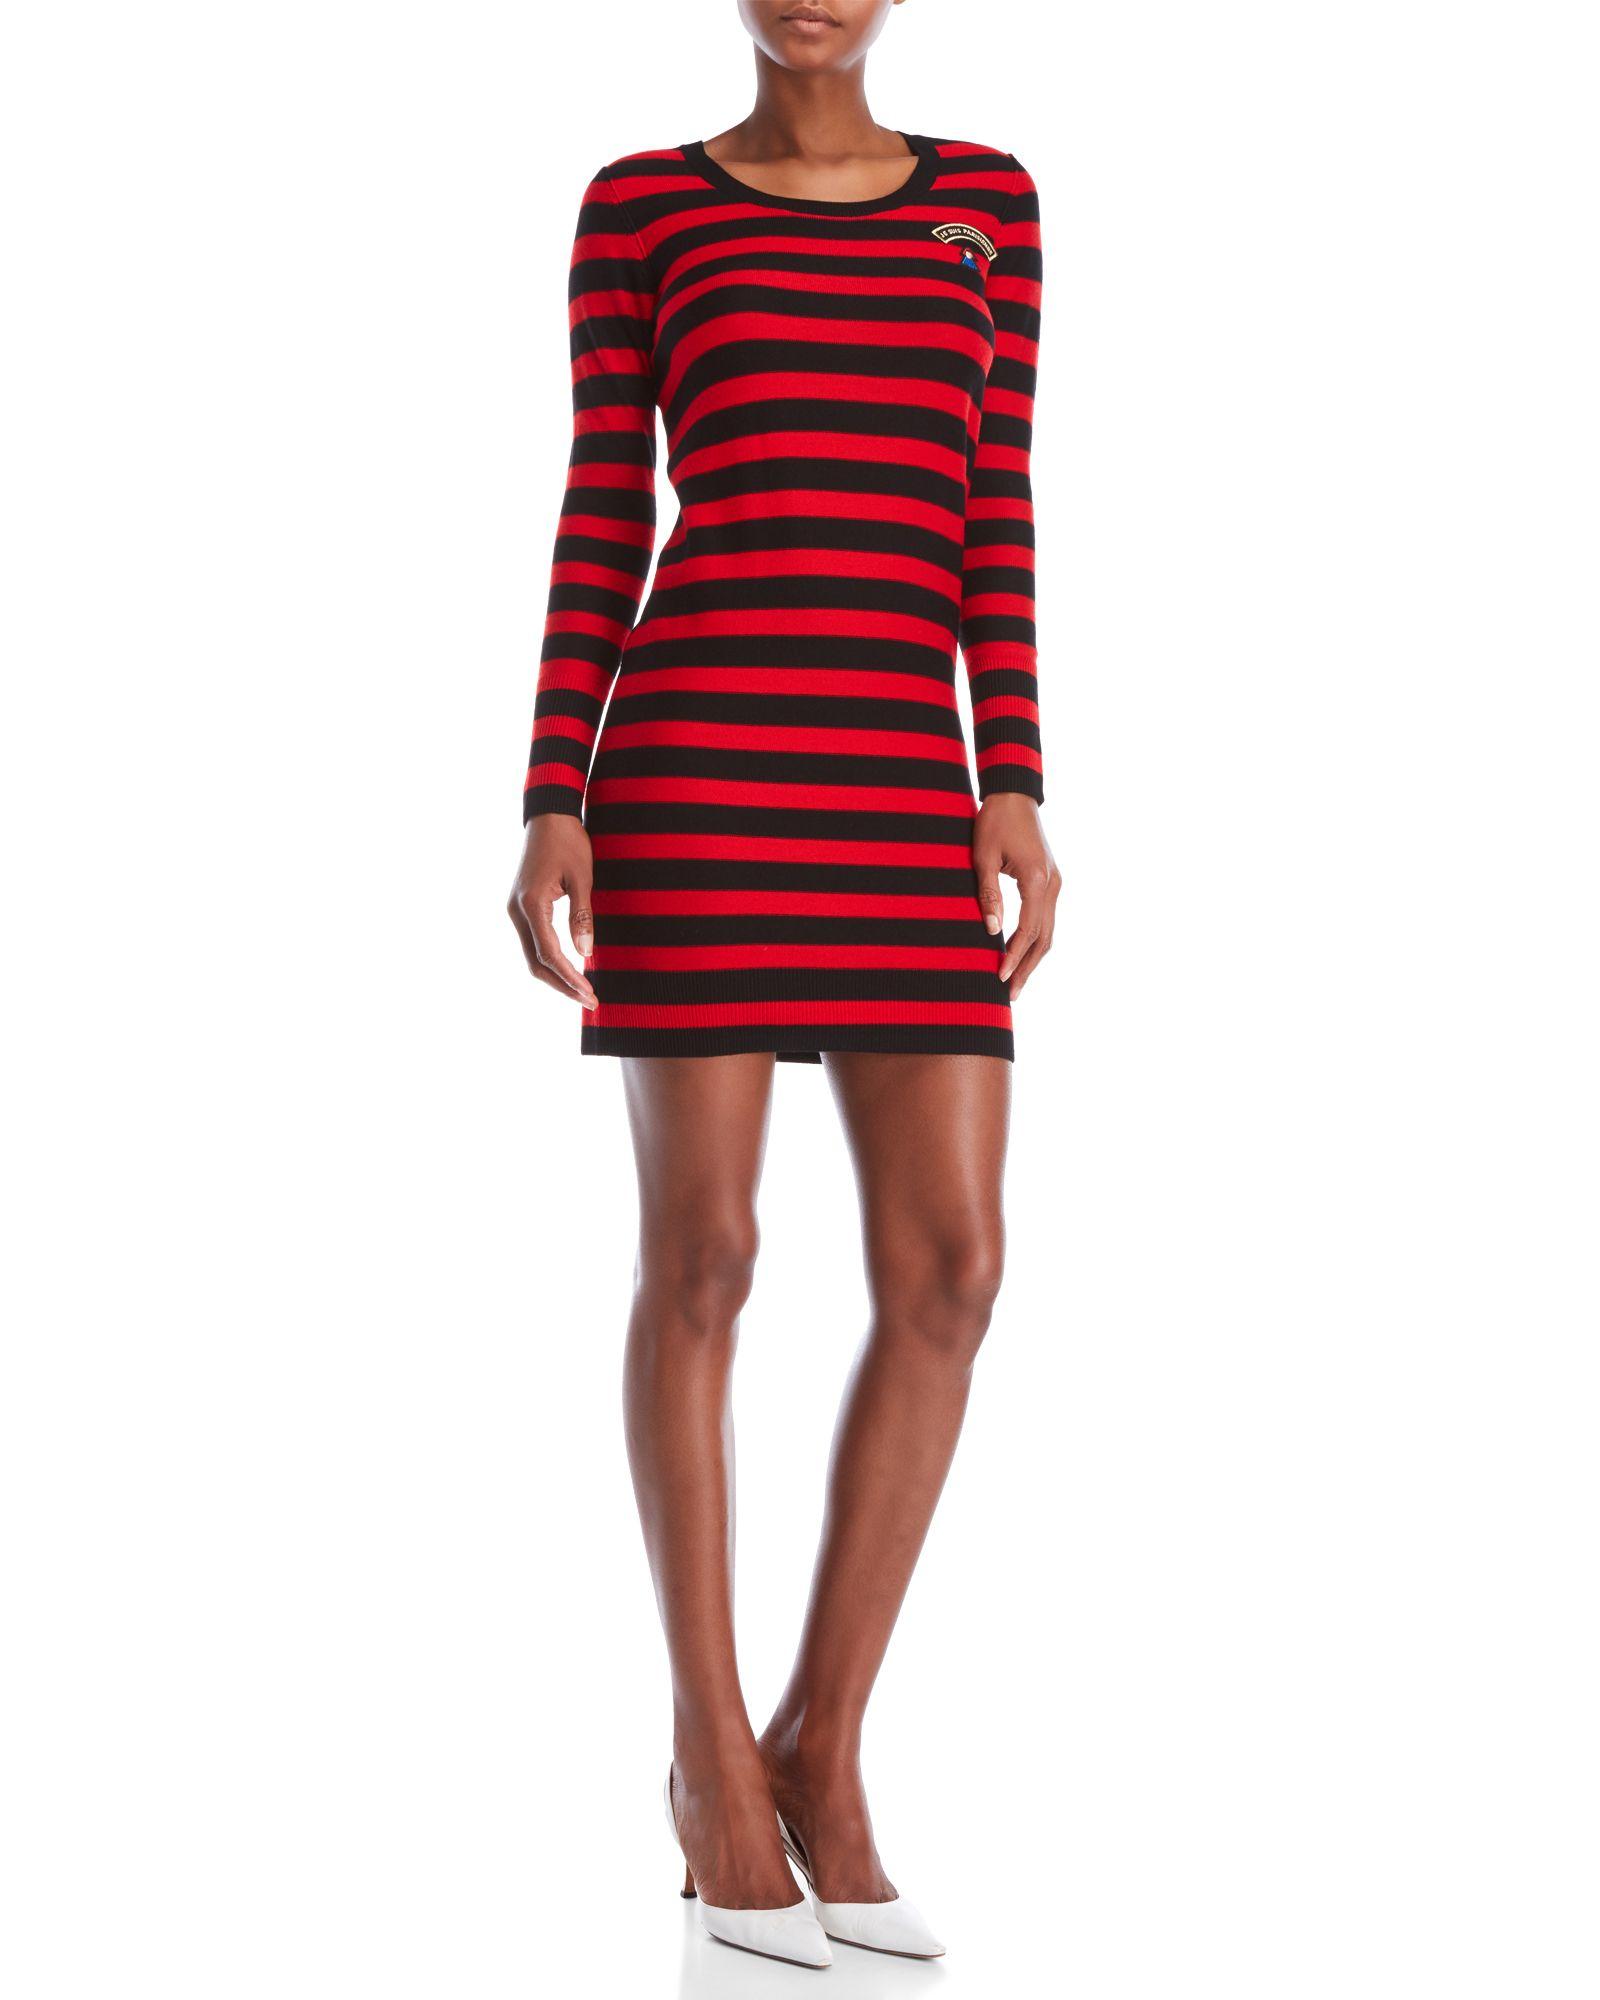 ba6d33f7e0 Sonia By Sonia Rykiel Striped Wool Sweater Dress | *Apparel ...